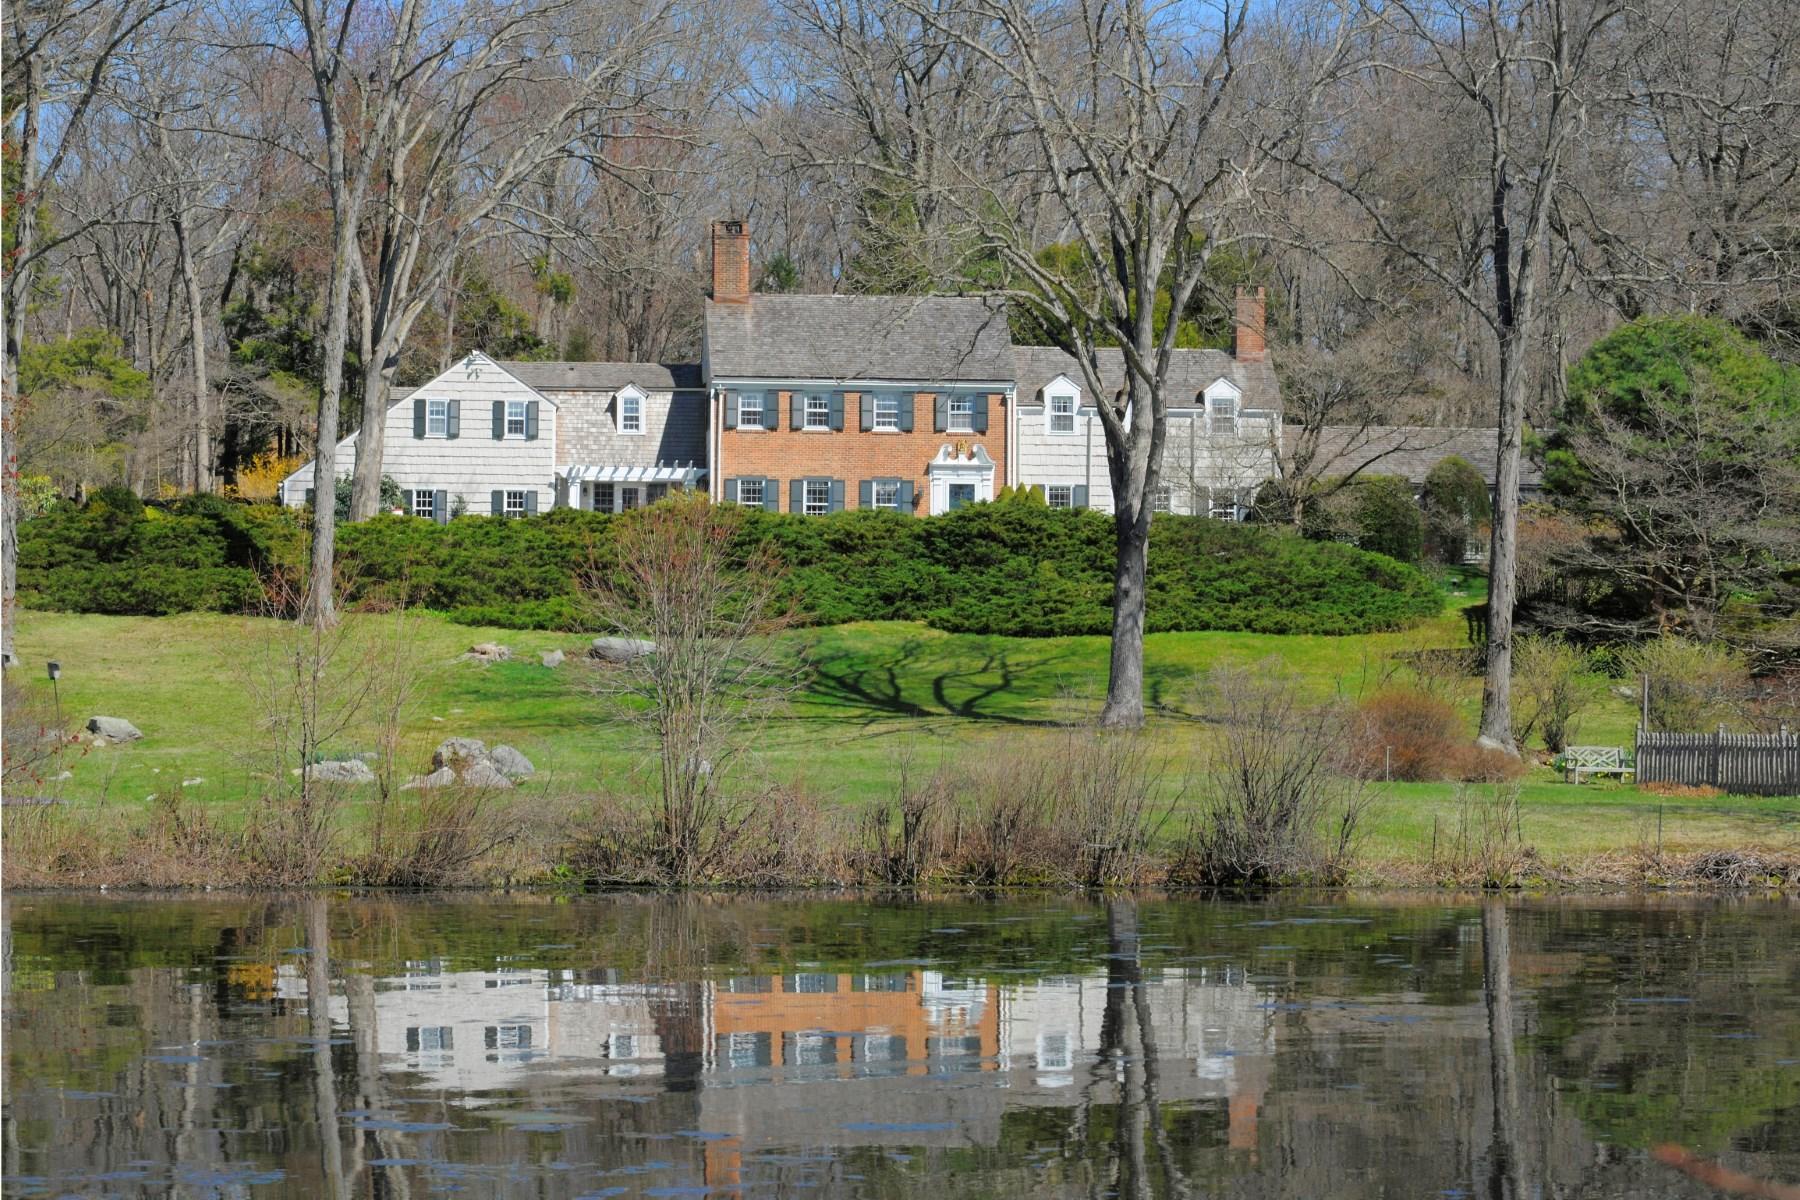 獨棟家庭住宅 為 出售 在 295 Round Hill Road, Greenwich CT Mid-Country, Greenwich, 康涅狄格州, 06831 美國